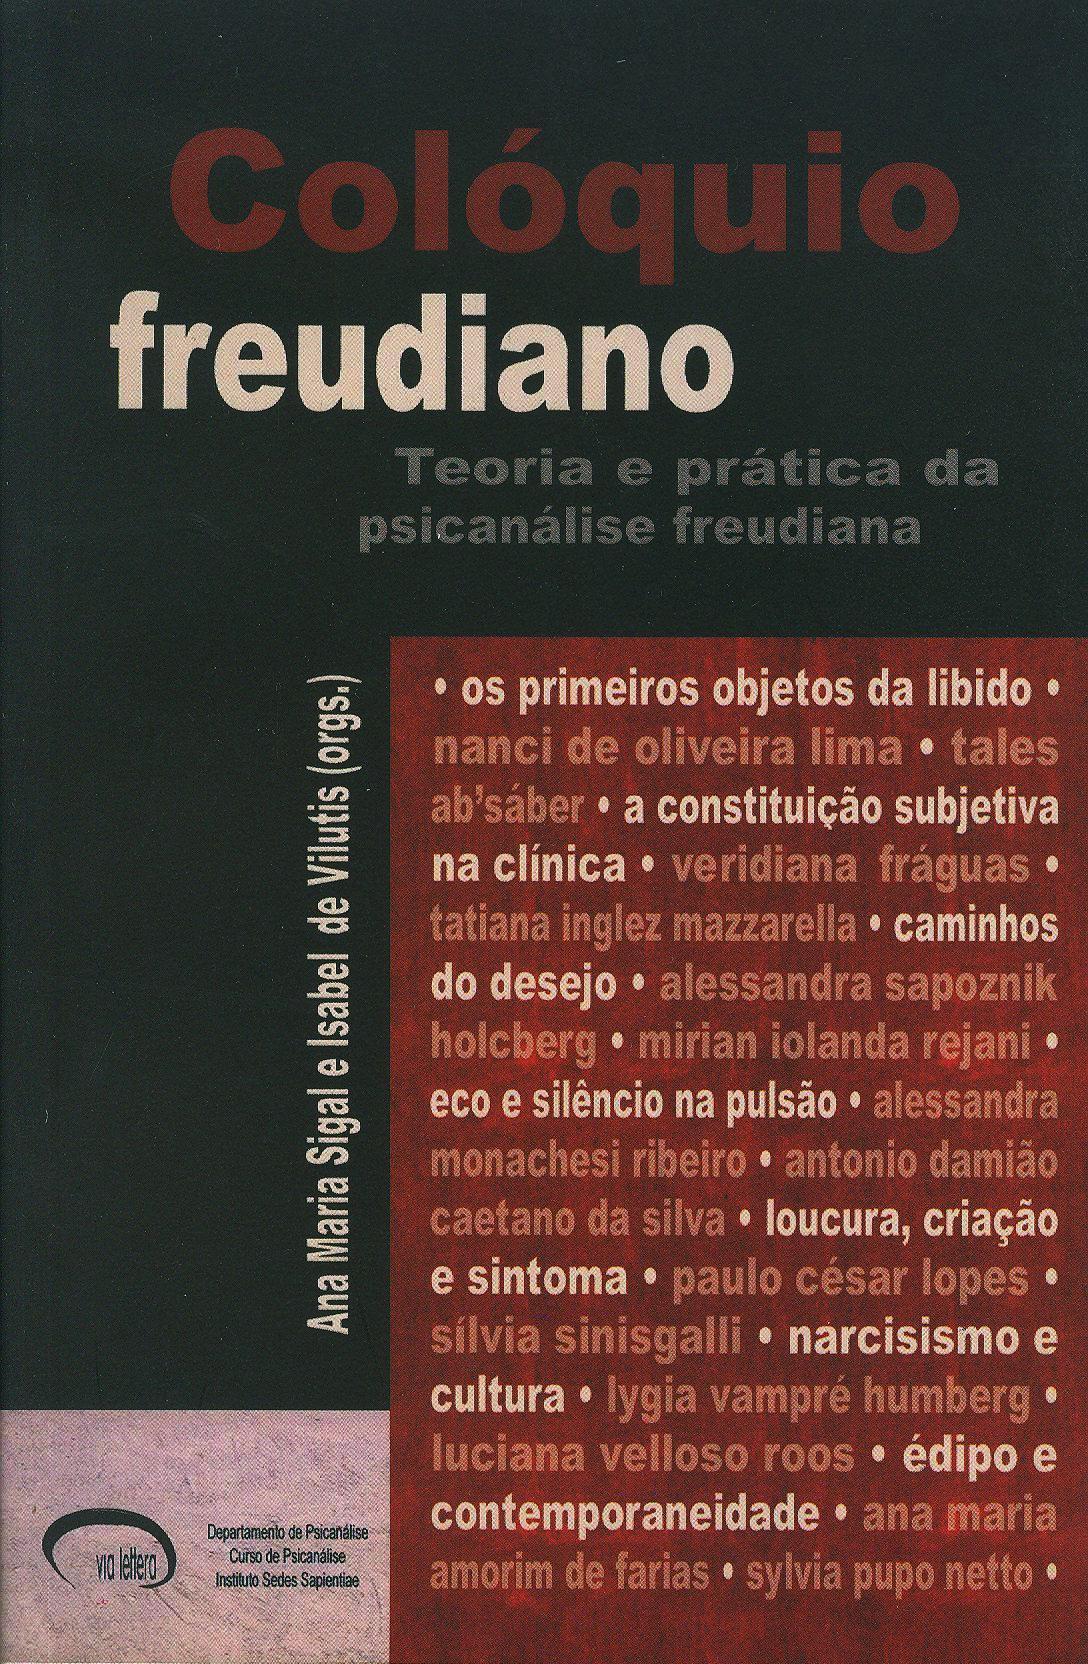 Colóquio freudiano - Teoria e pratica da psicanalise freudiana